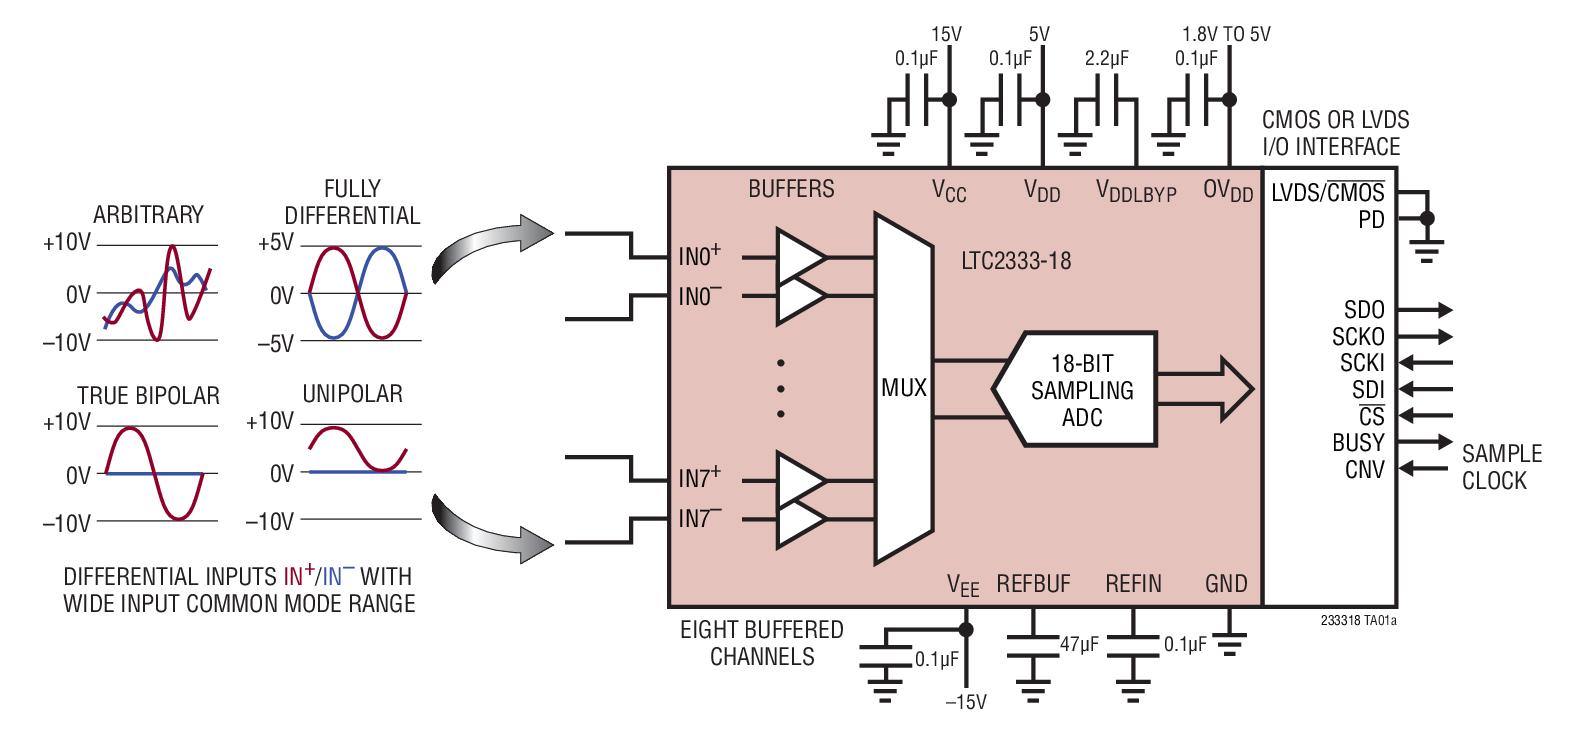 ltc2333clx-18-集成电路-51电子网